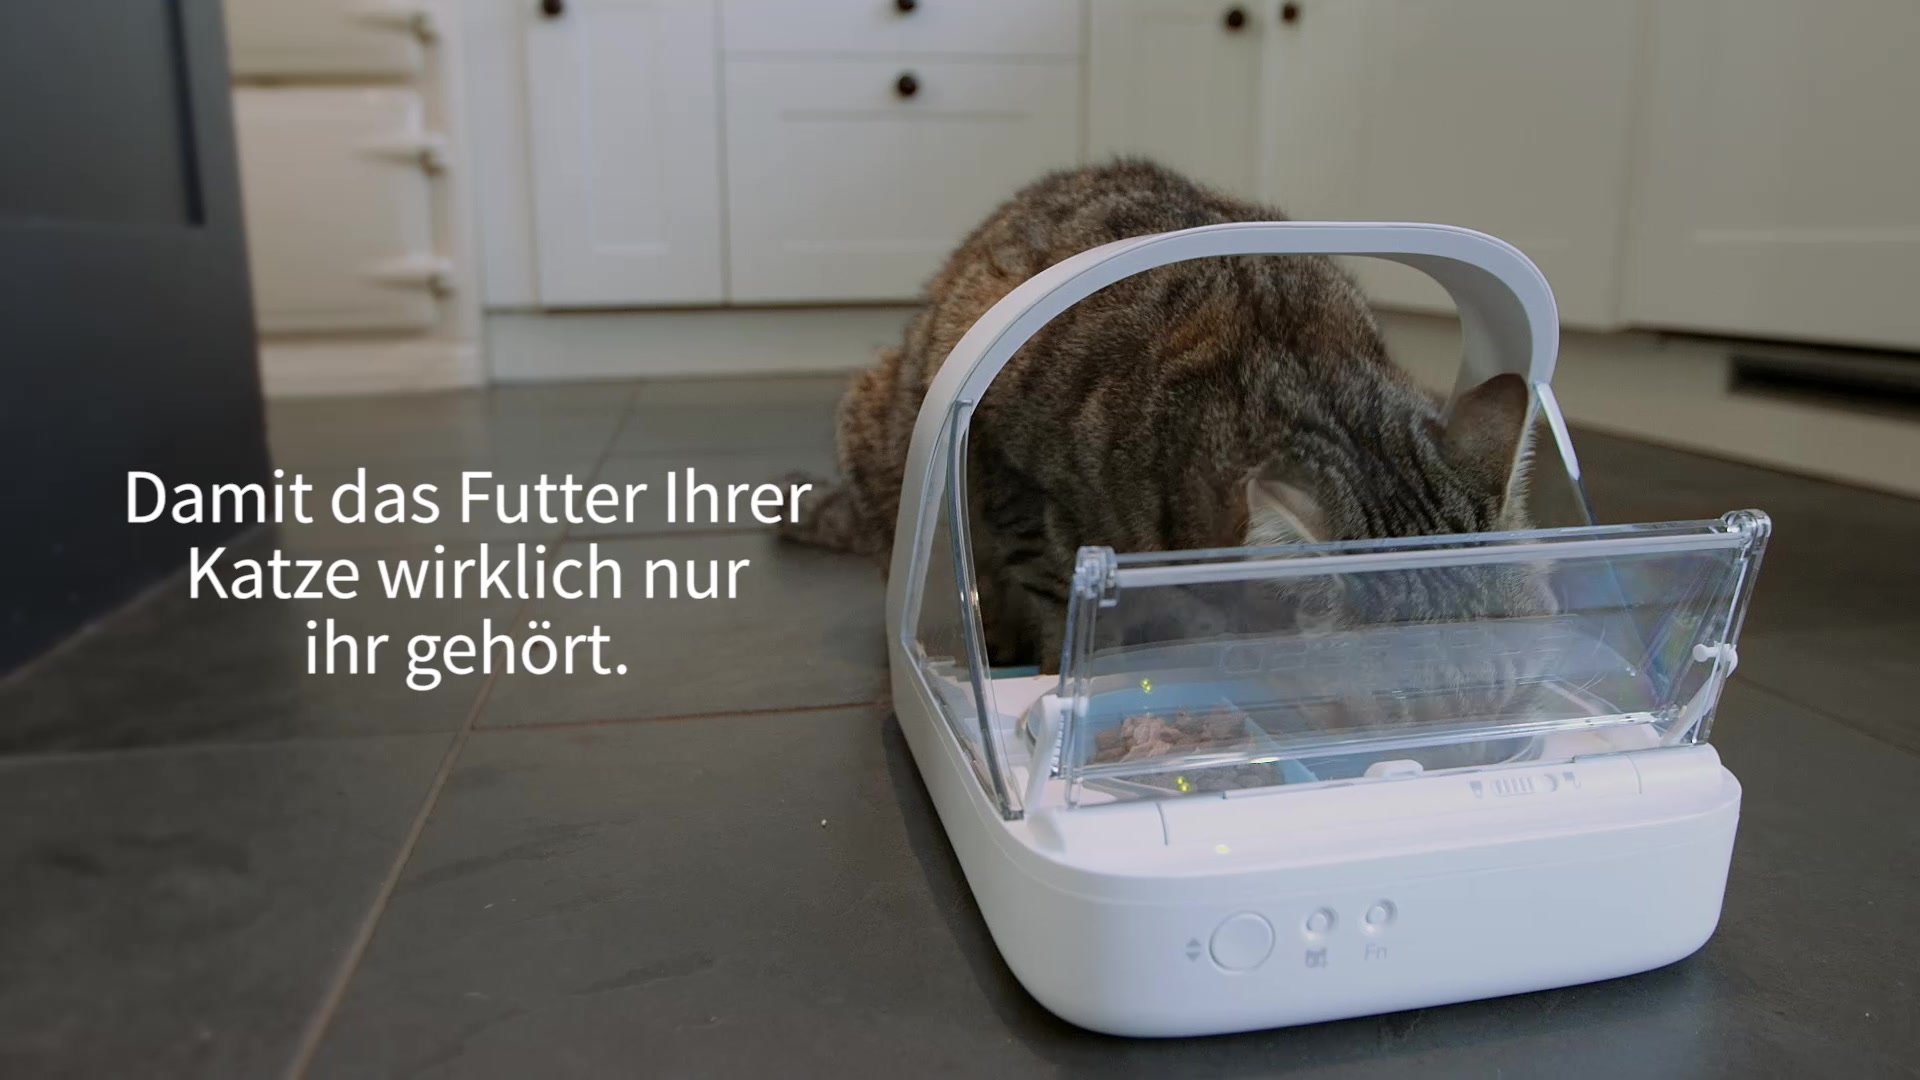 SureFeed Futterschale-Set Haustier-Zubeh/ör Futterschale-Set MBSBU